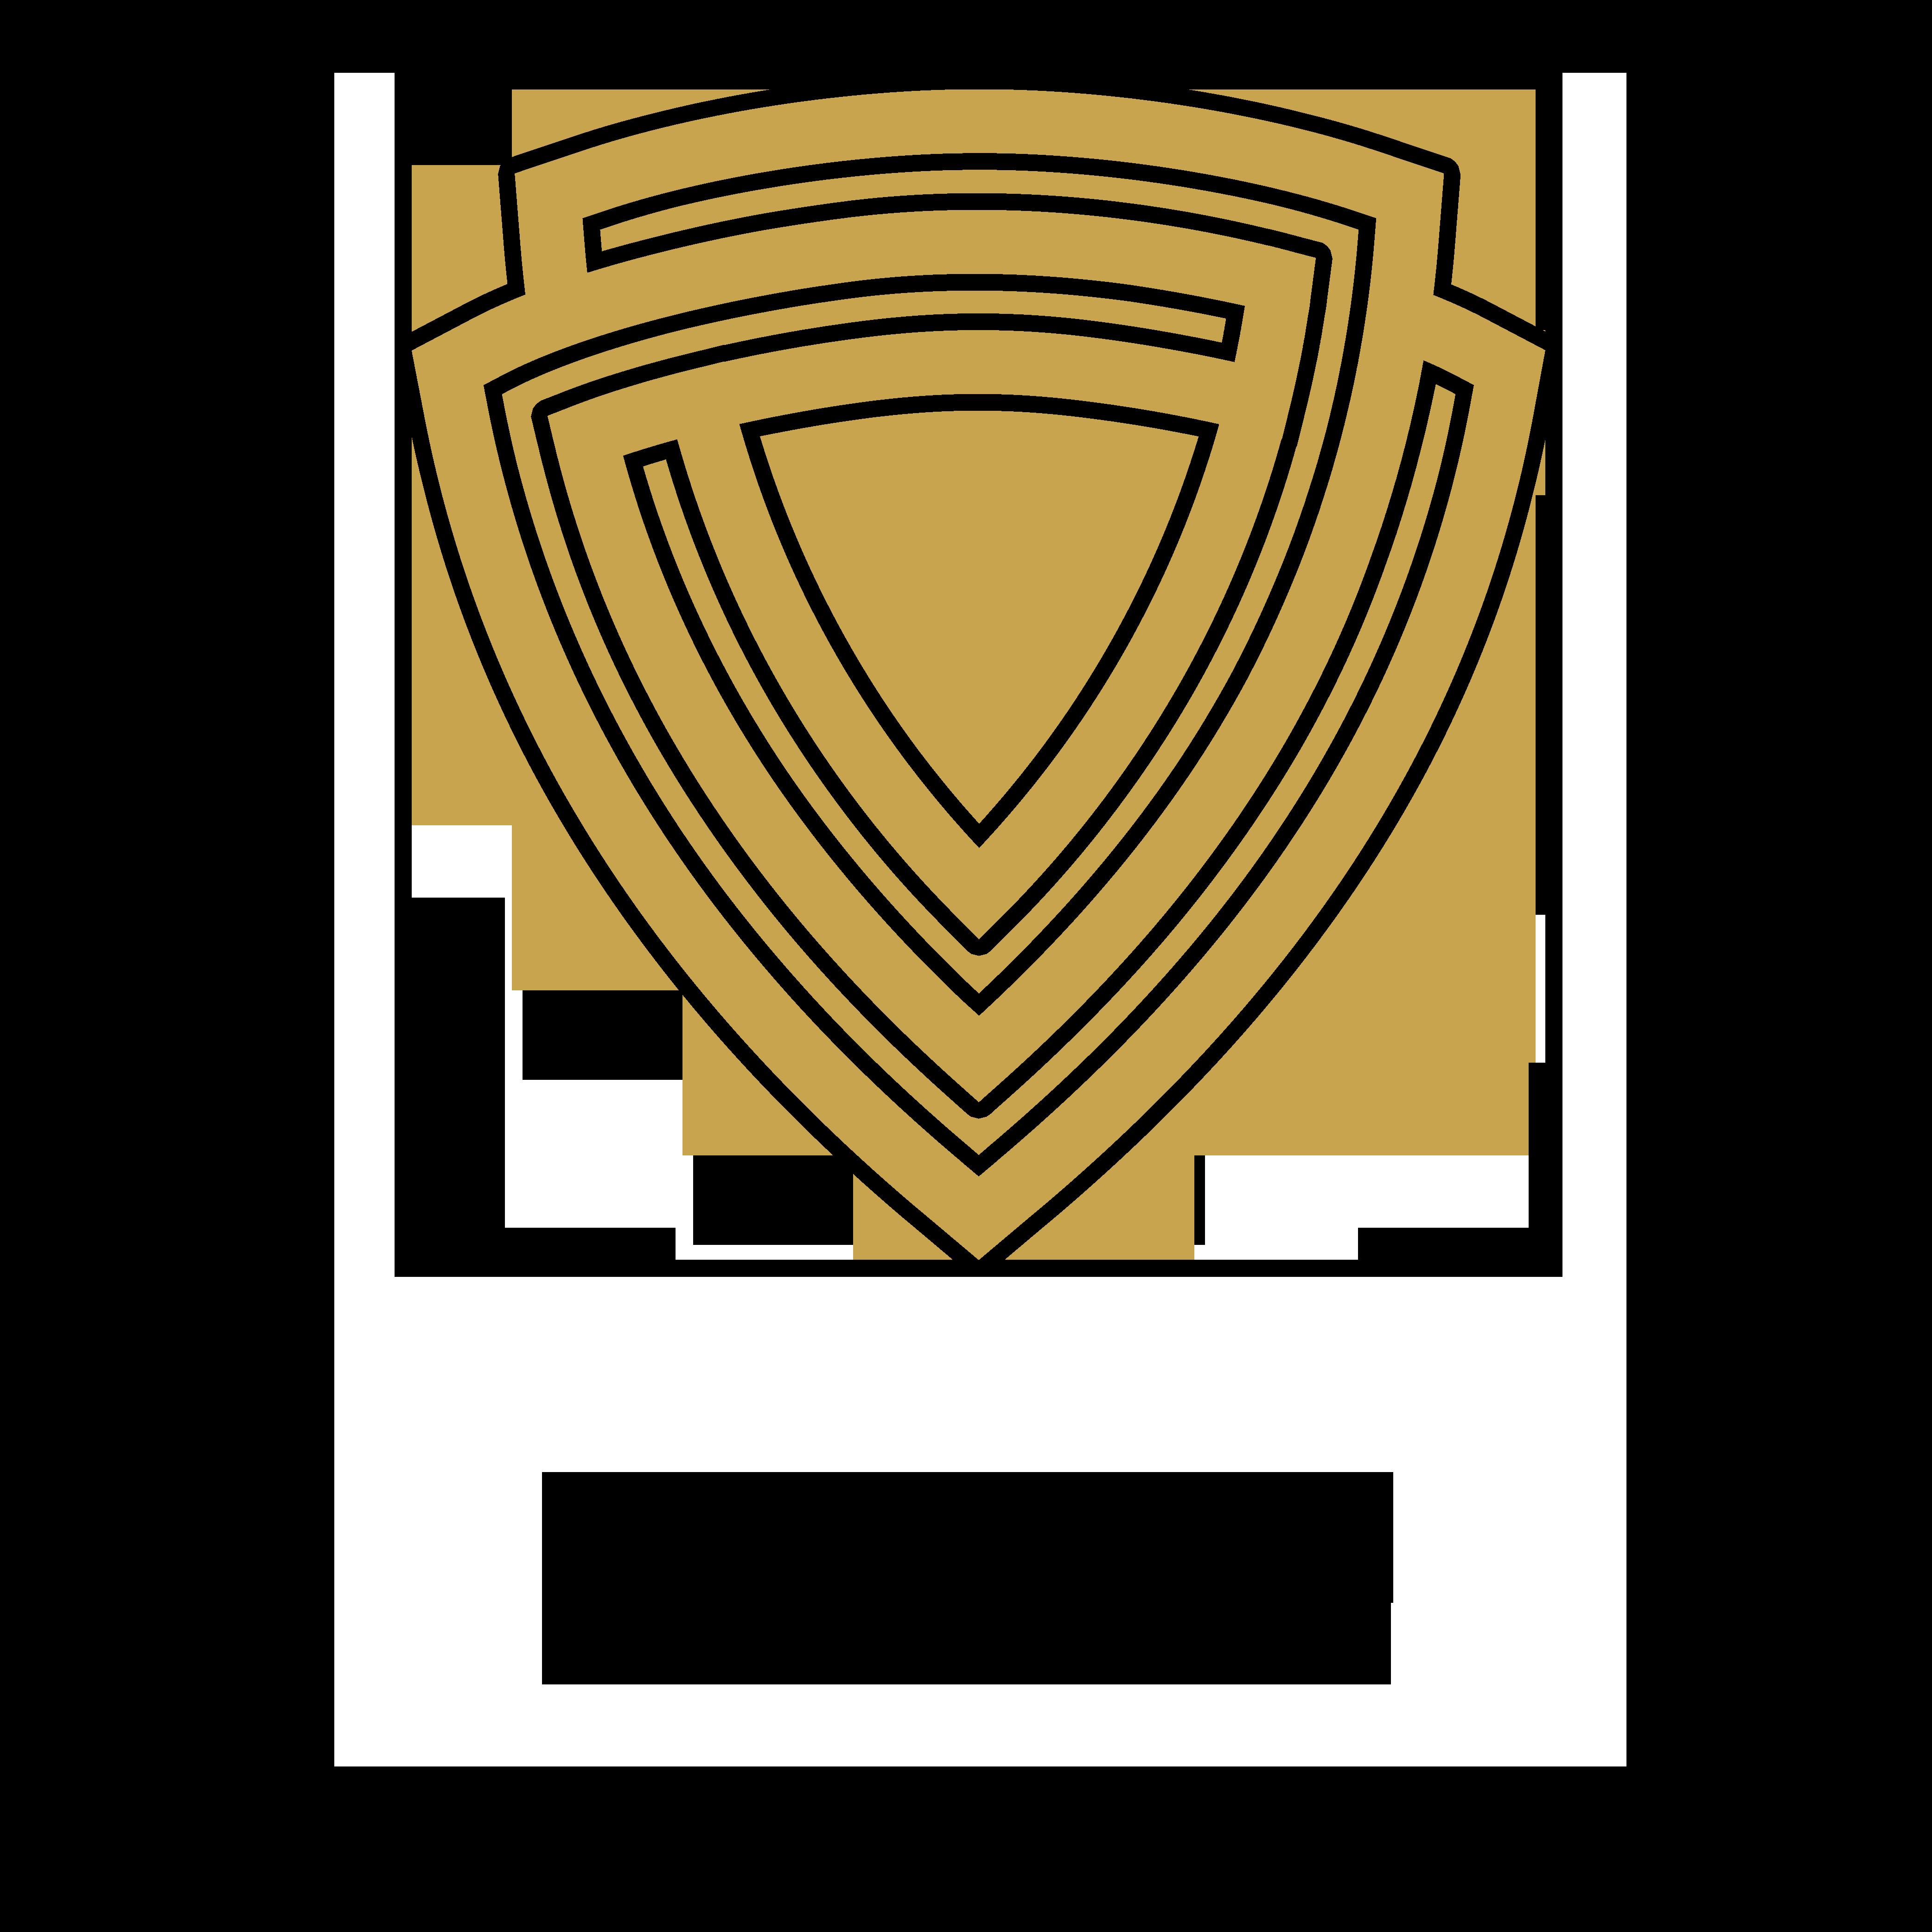 Gold Pest Control Plan